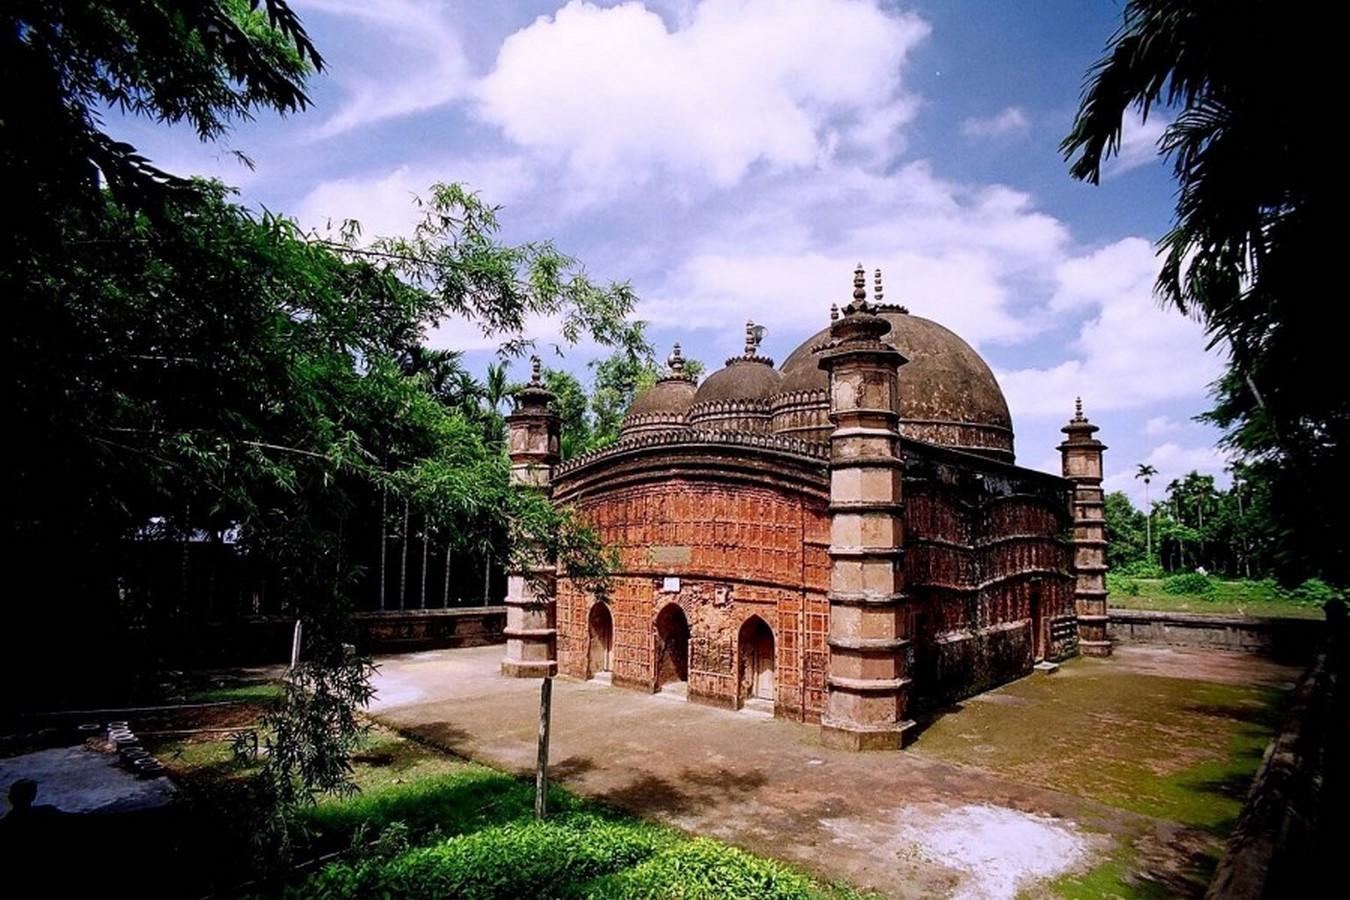 Heritage Mosques in Bangladesh - Sheet8